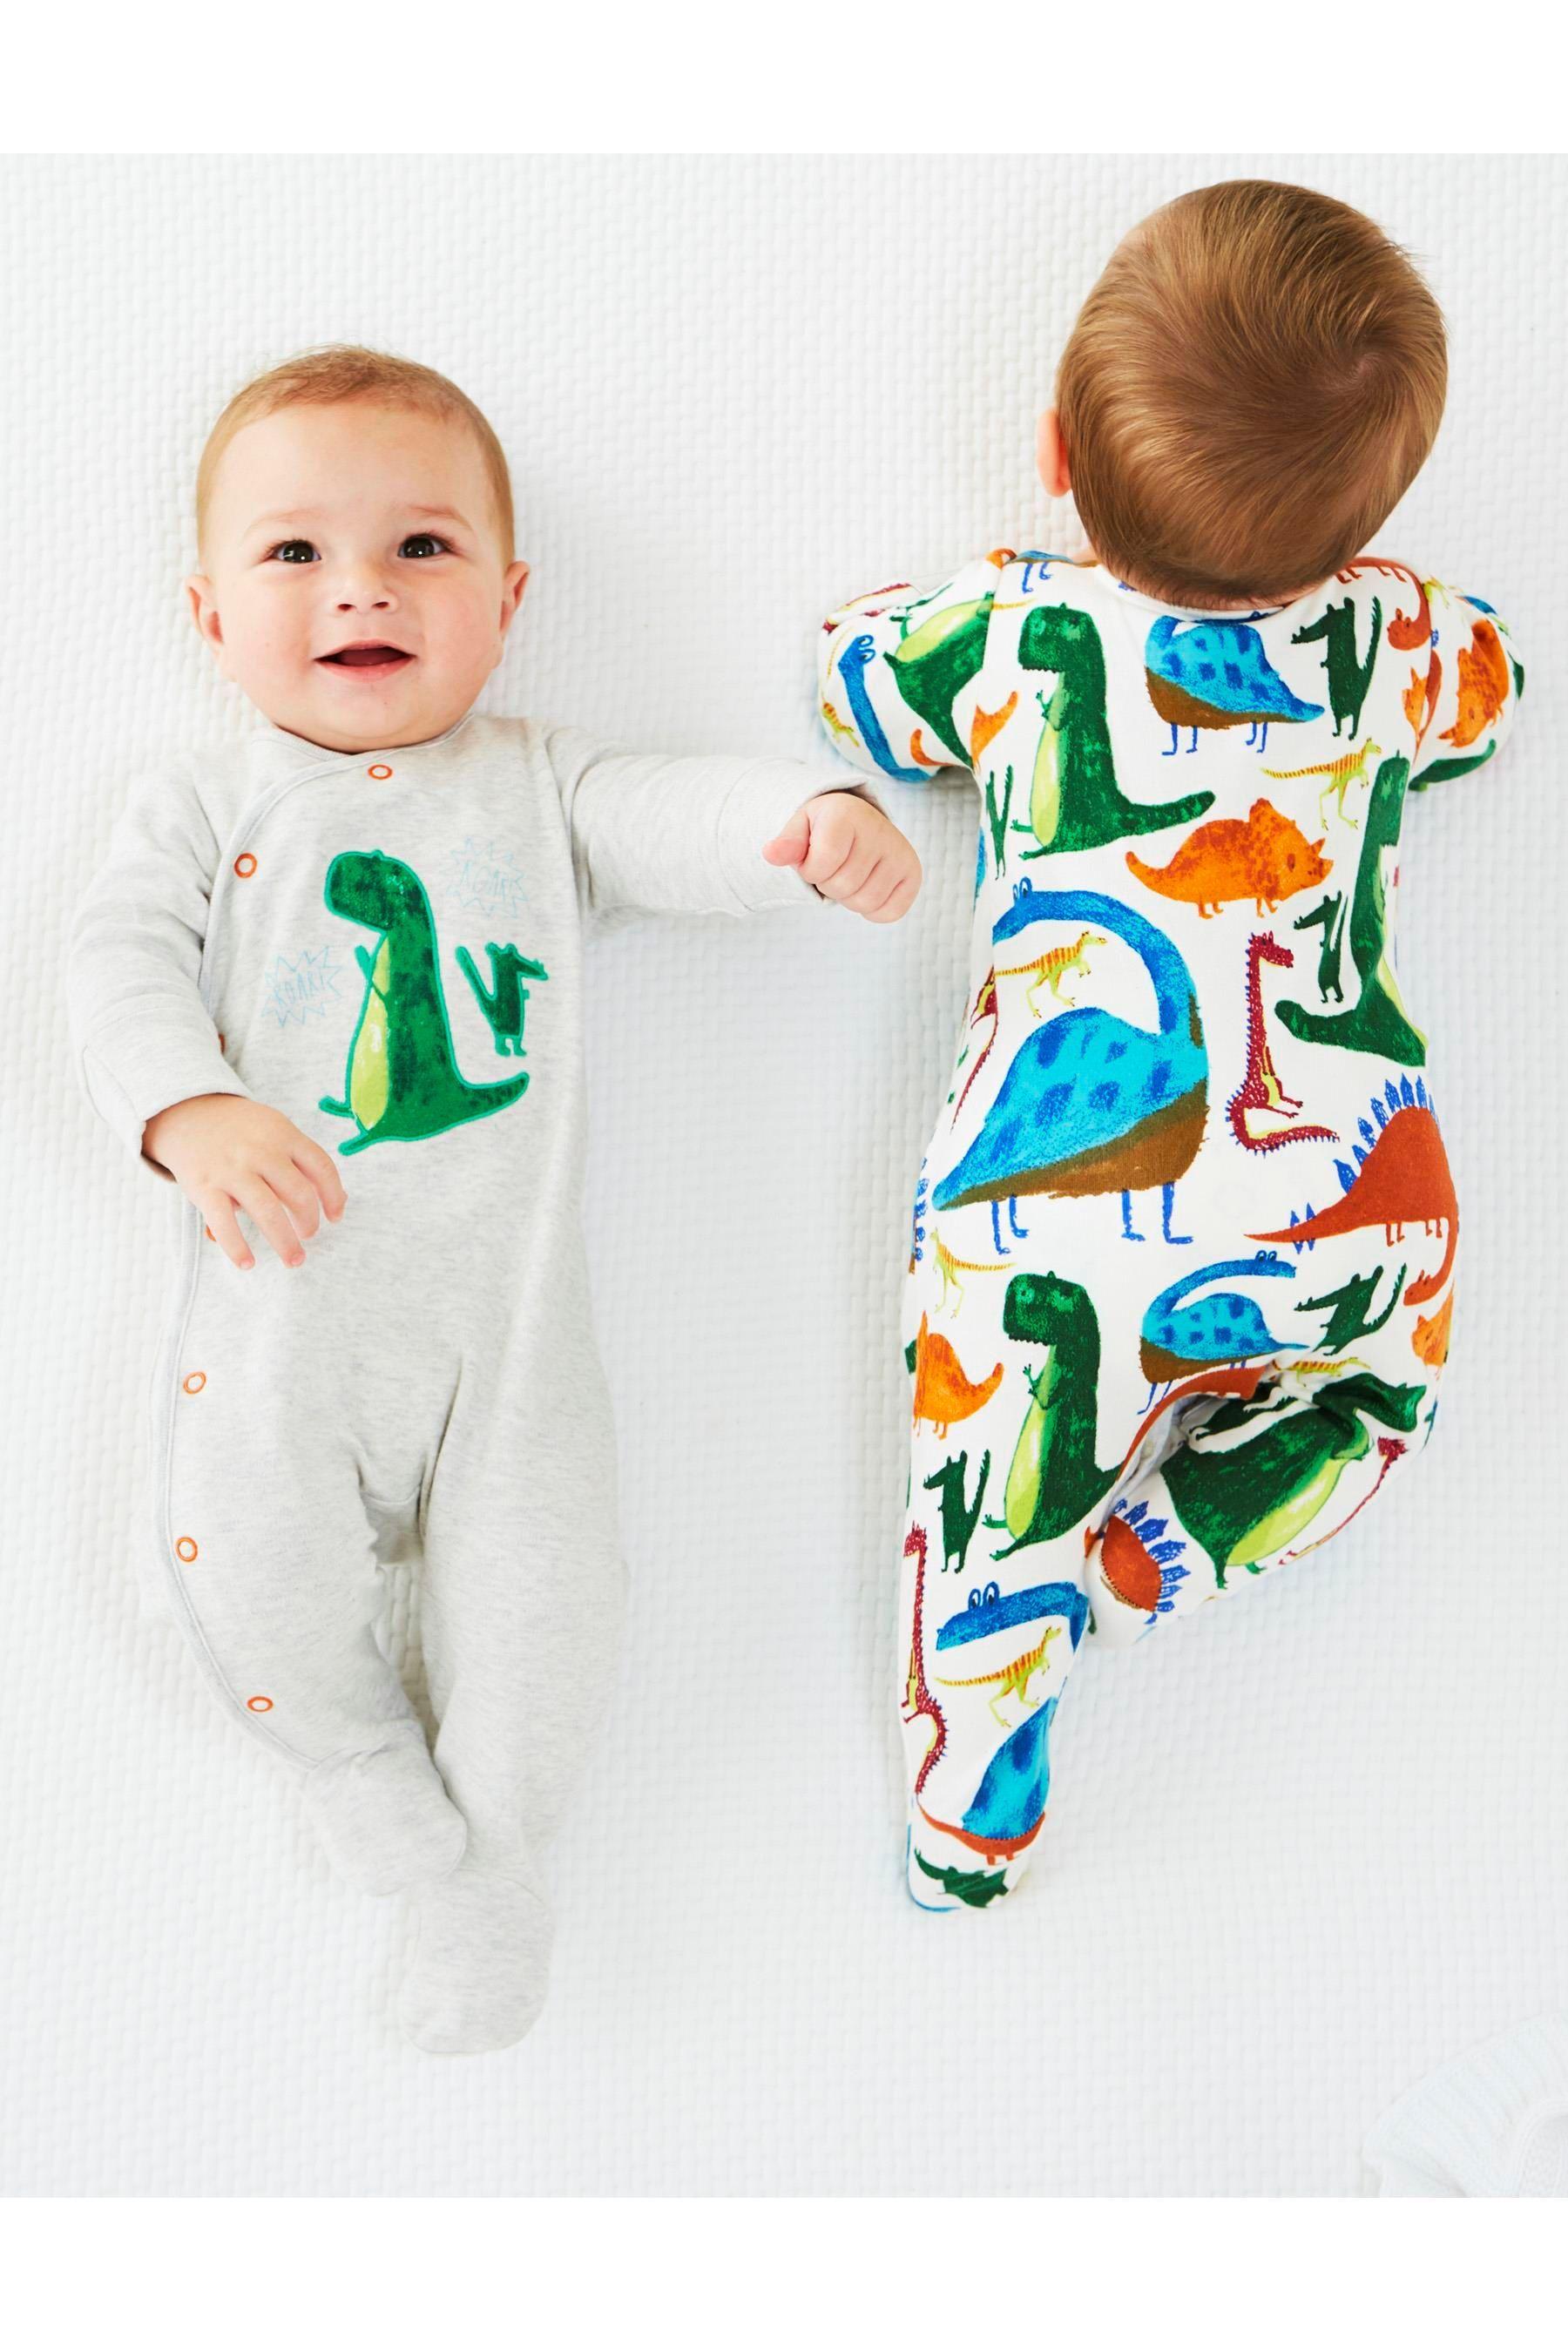 Boys' Clothing (newborn-5t) Hard-Working Junior J Boys Sleepsuits Age 3-6 Months